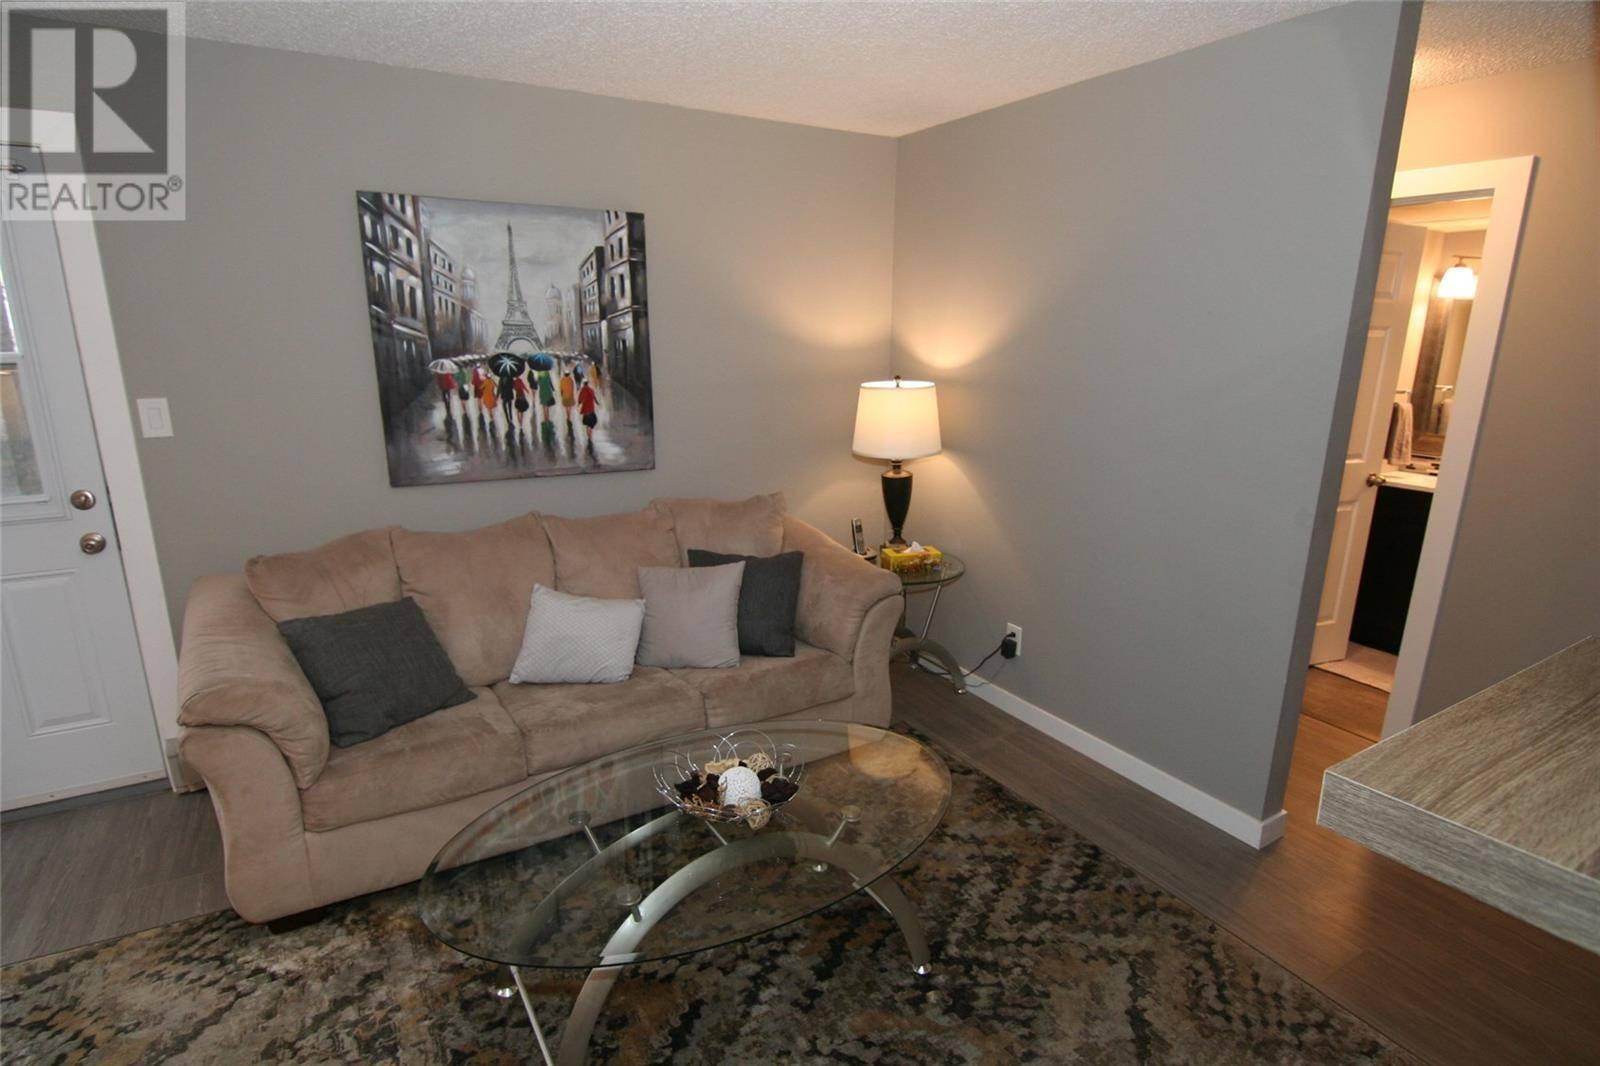 Condo for sale at 431 4th Ave N Unit 207 Saskatoon Saskatchewan - MLS: SK792934